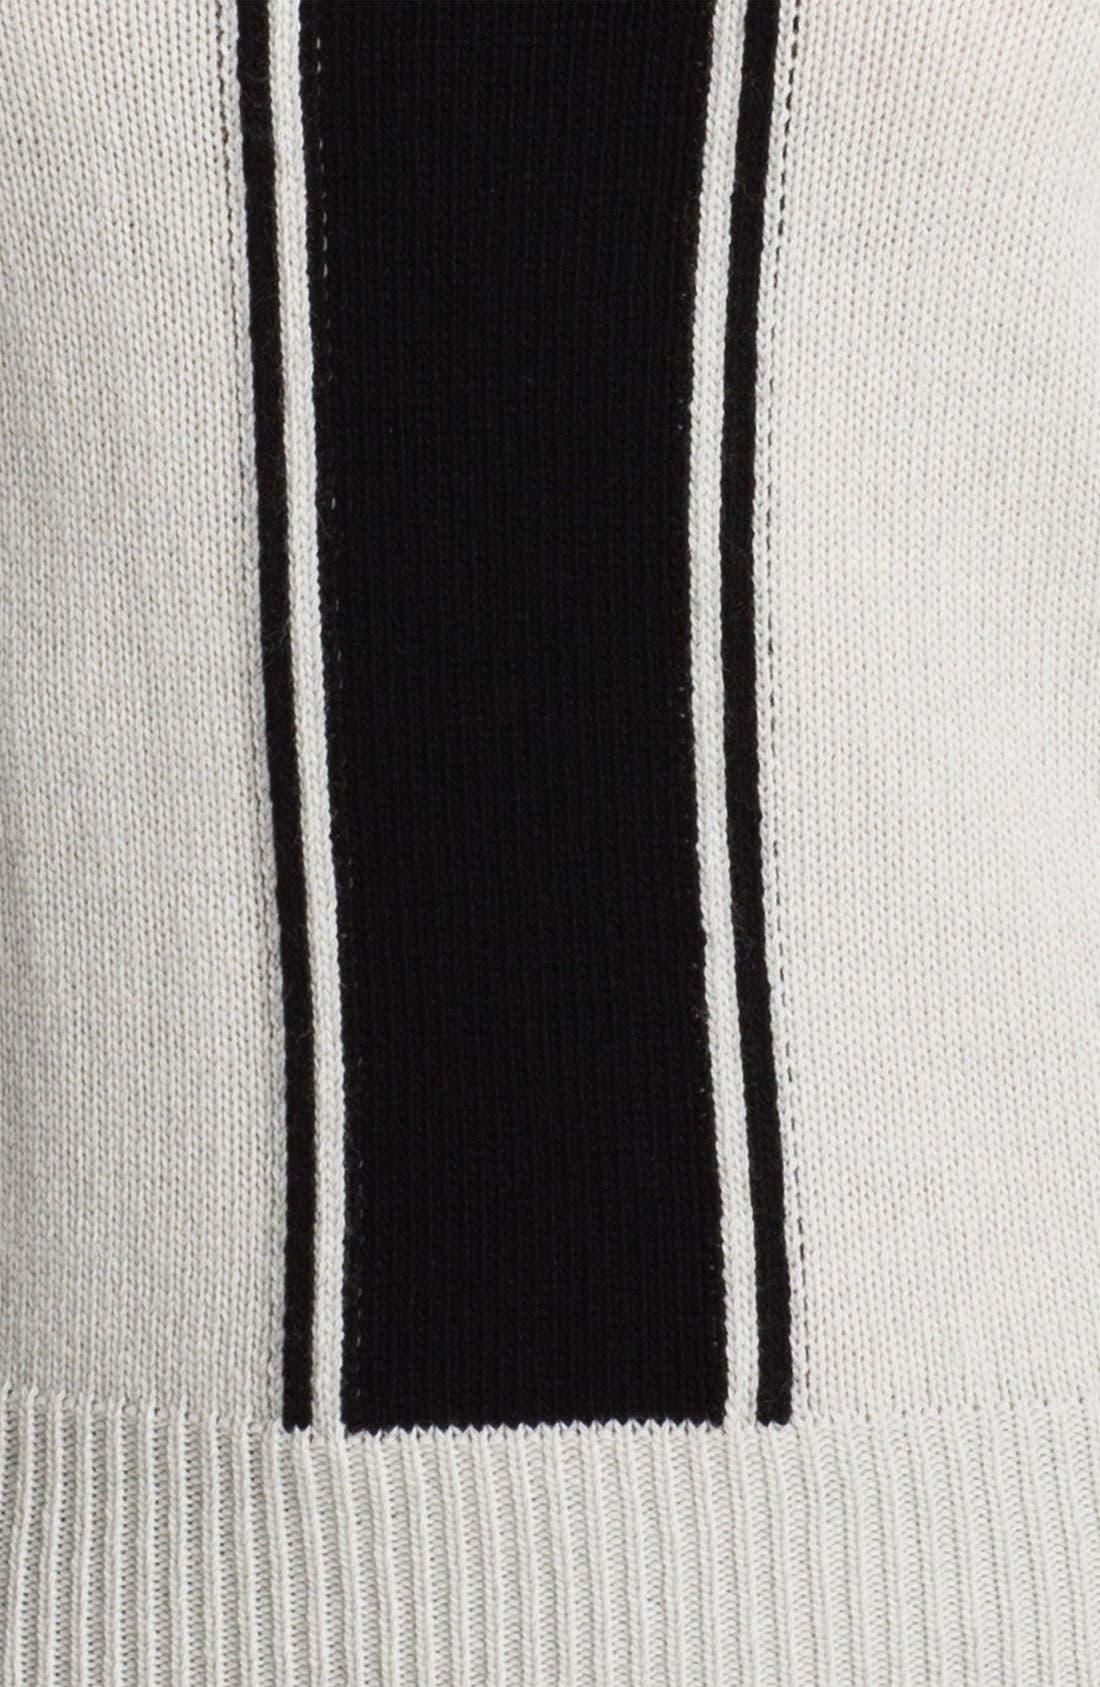 Alternate Image 3  - Theory 'Angine S.' Sweater